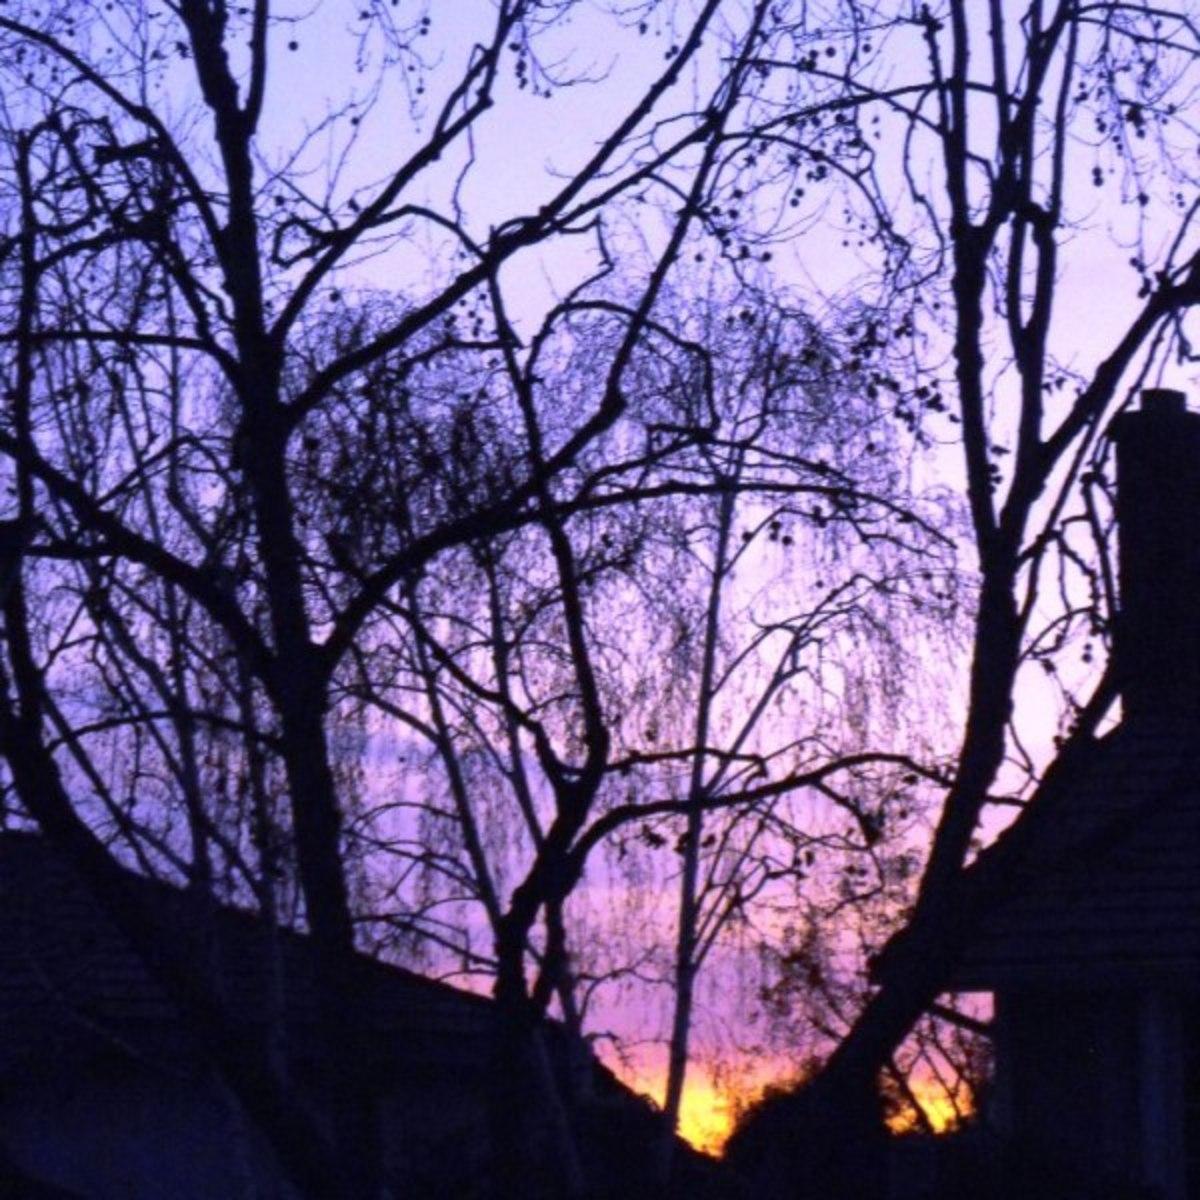 Winter Sunset in La Verne, CA